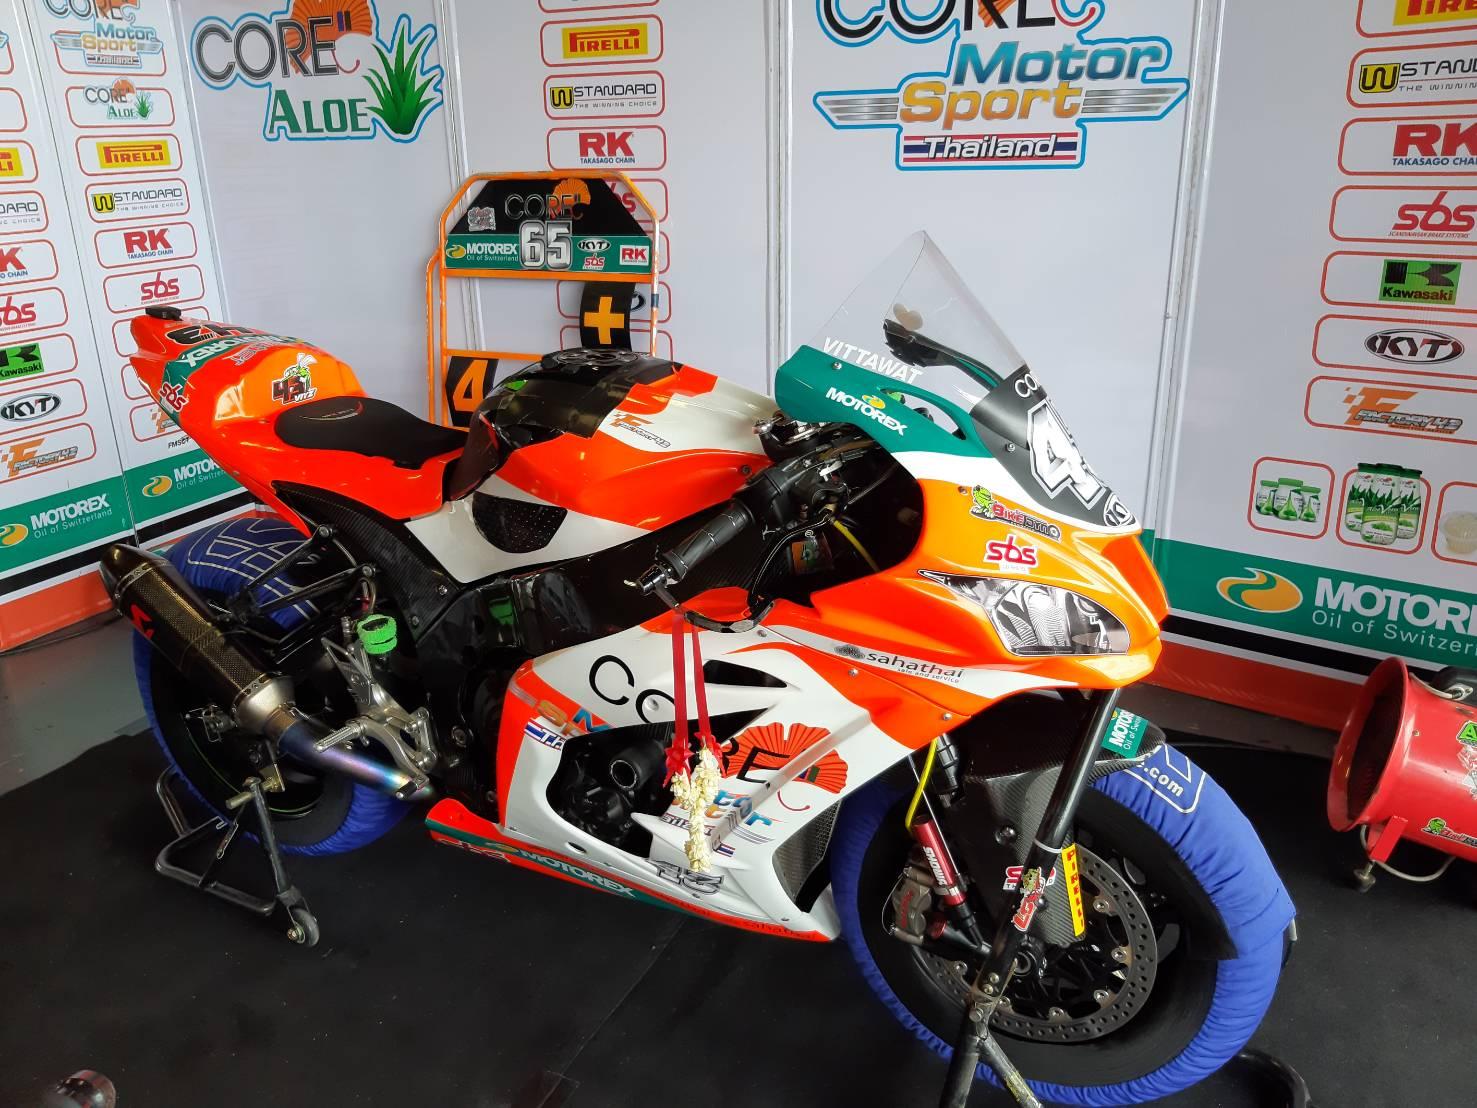 Sunstar ได้เป็น sponsor ให้กับทีม Core motor sports